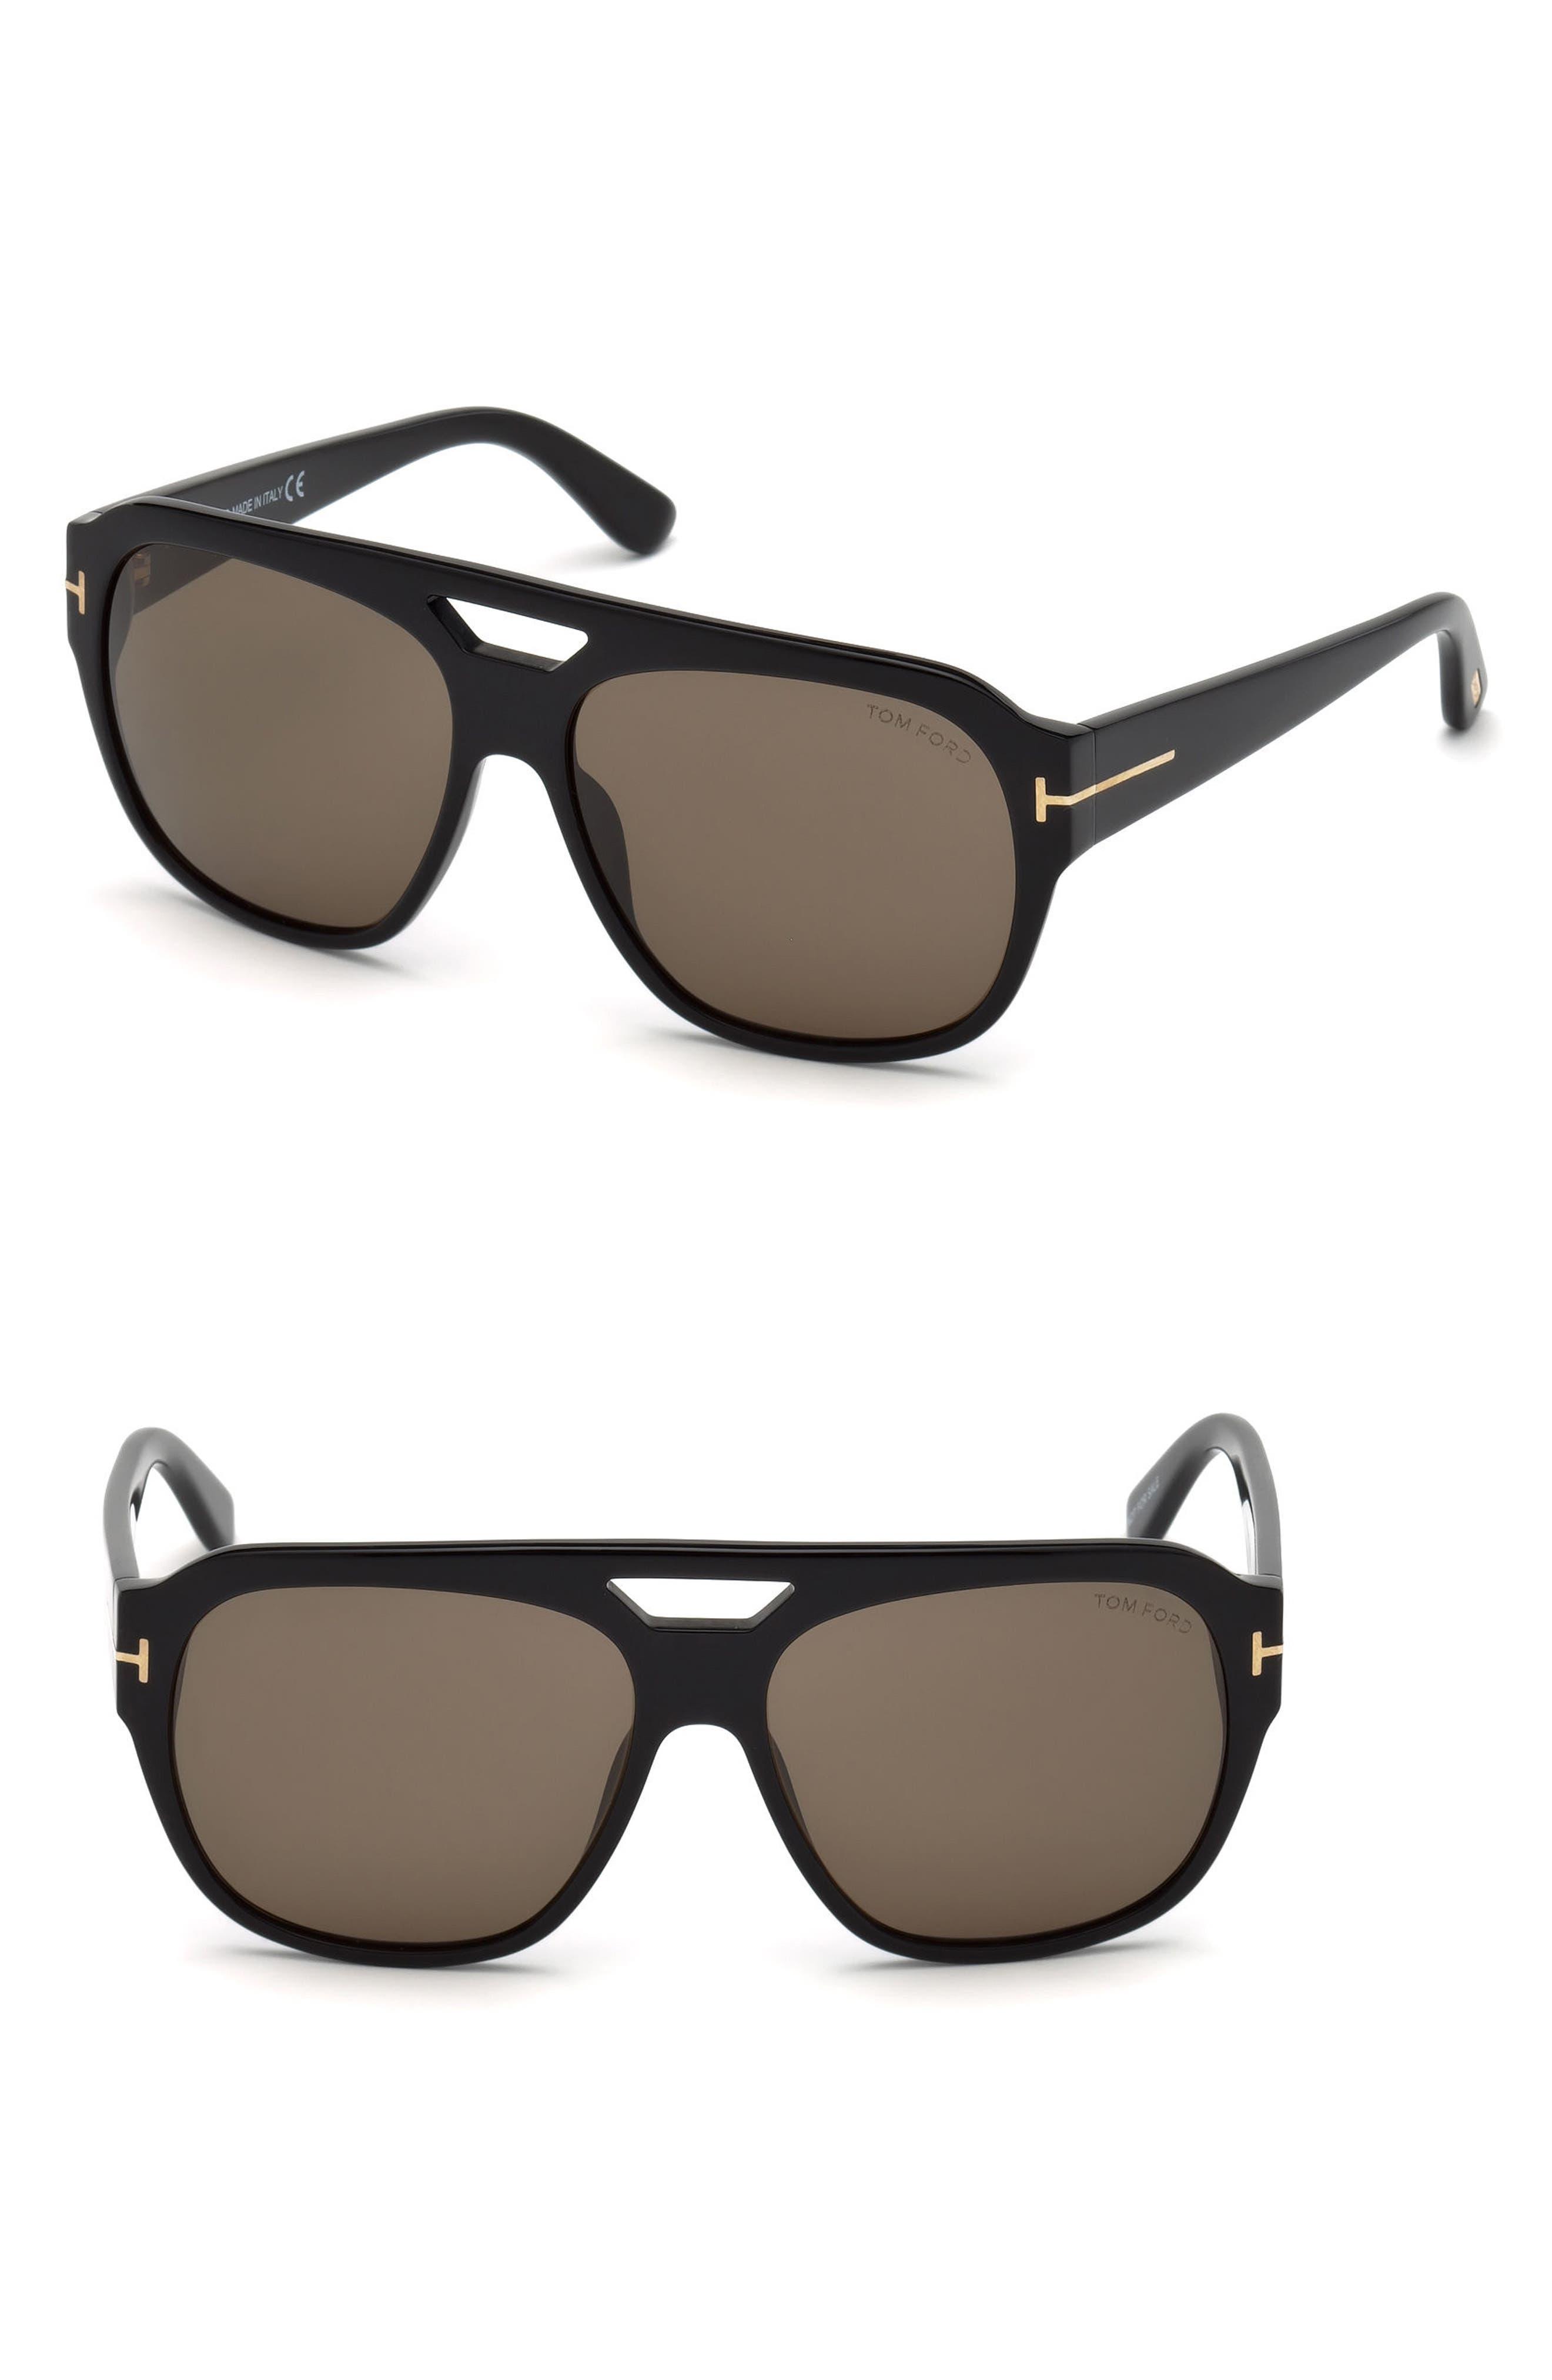 Barchardy 61mm Sunglasses,                         Main,                         color, SHINY BLACK / ROVIEX